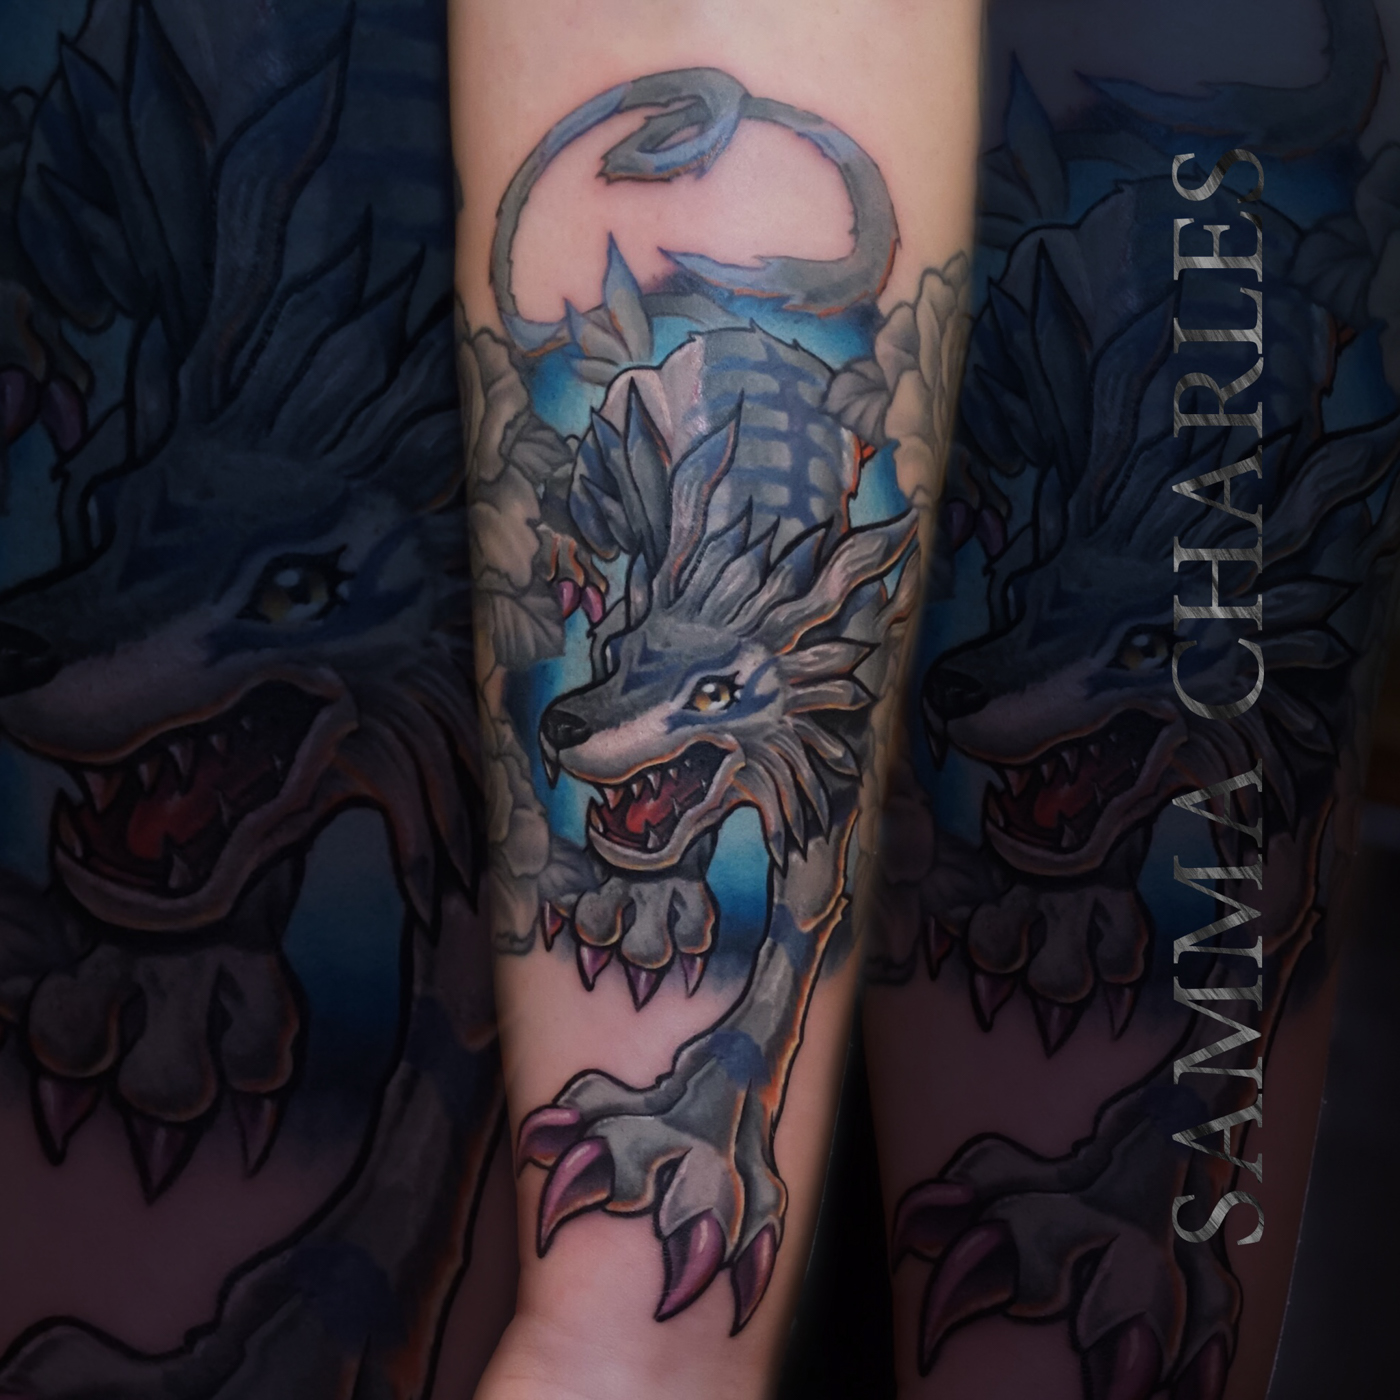 oxfordshire-tattoo-studio-44.jpg